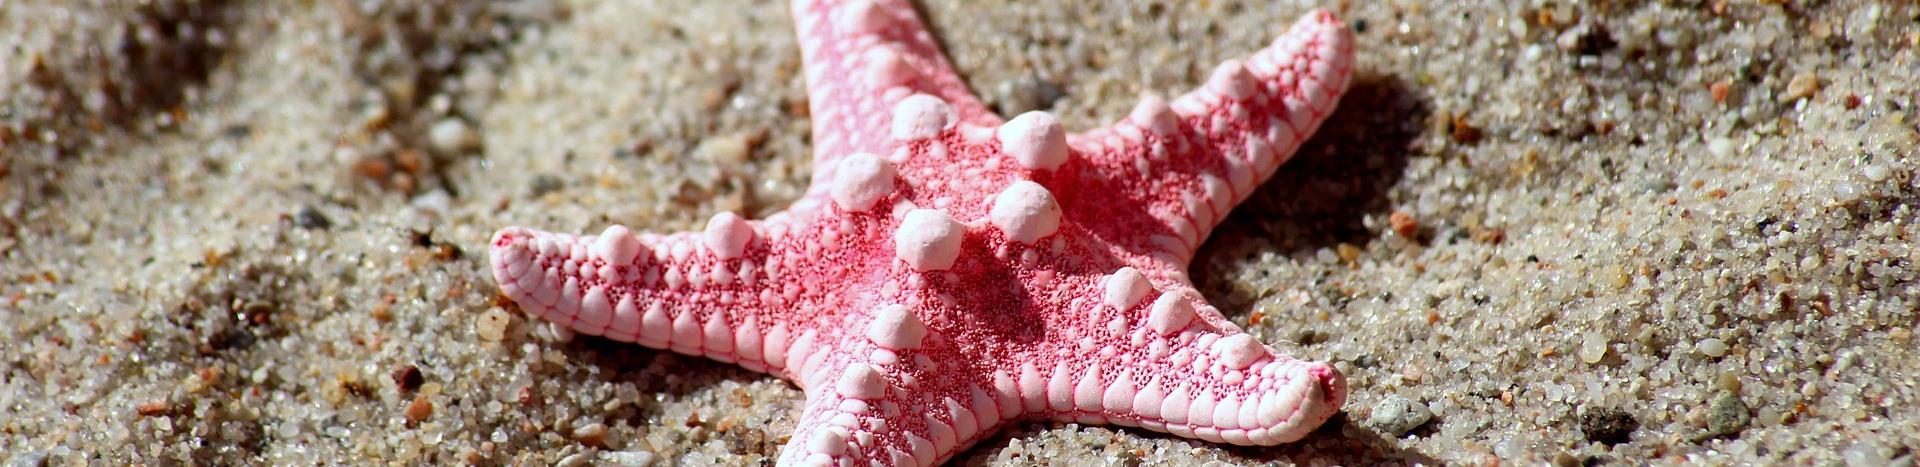 BandeauEtoilestarfish 4335085 1920